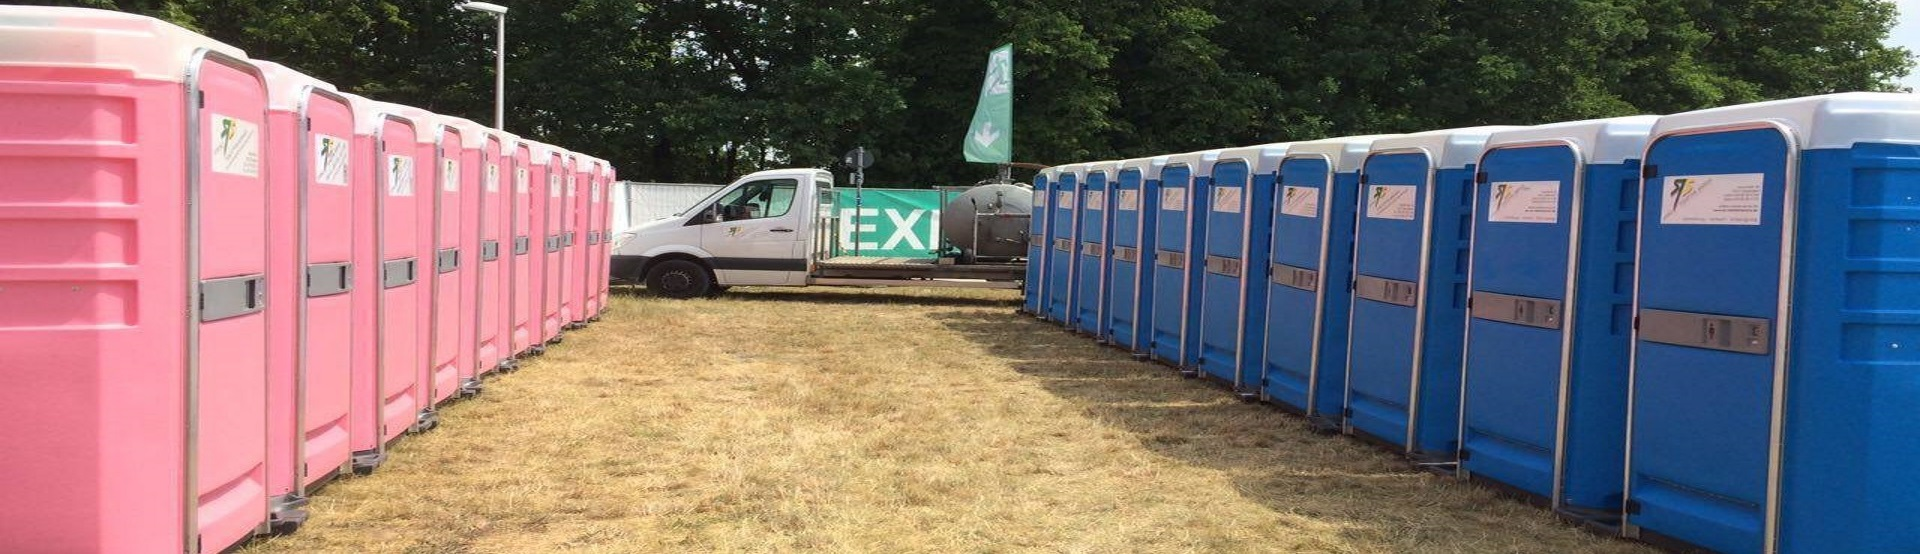 Stenz-Toiletten-Service-klo-mieten